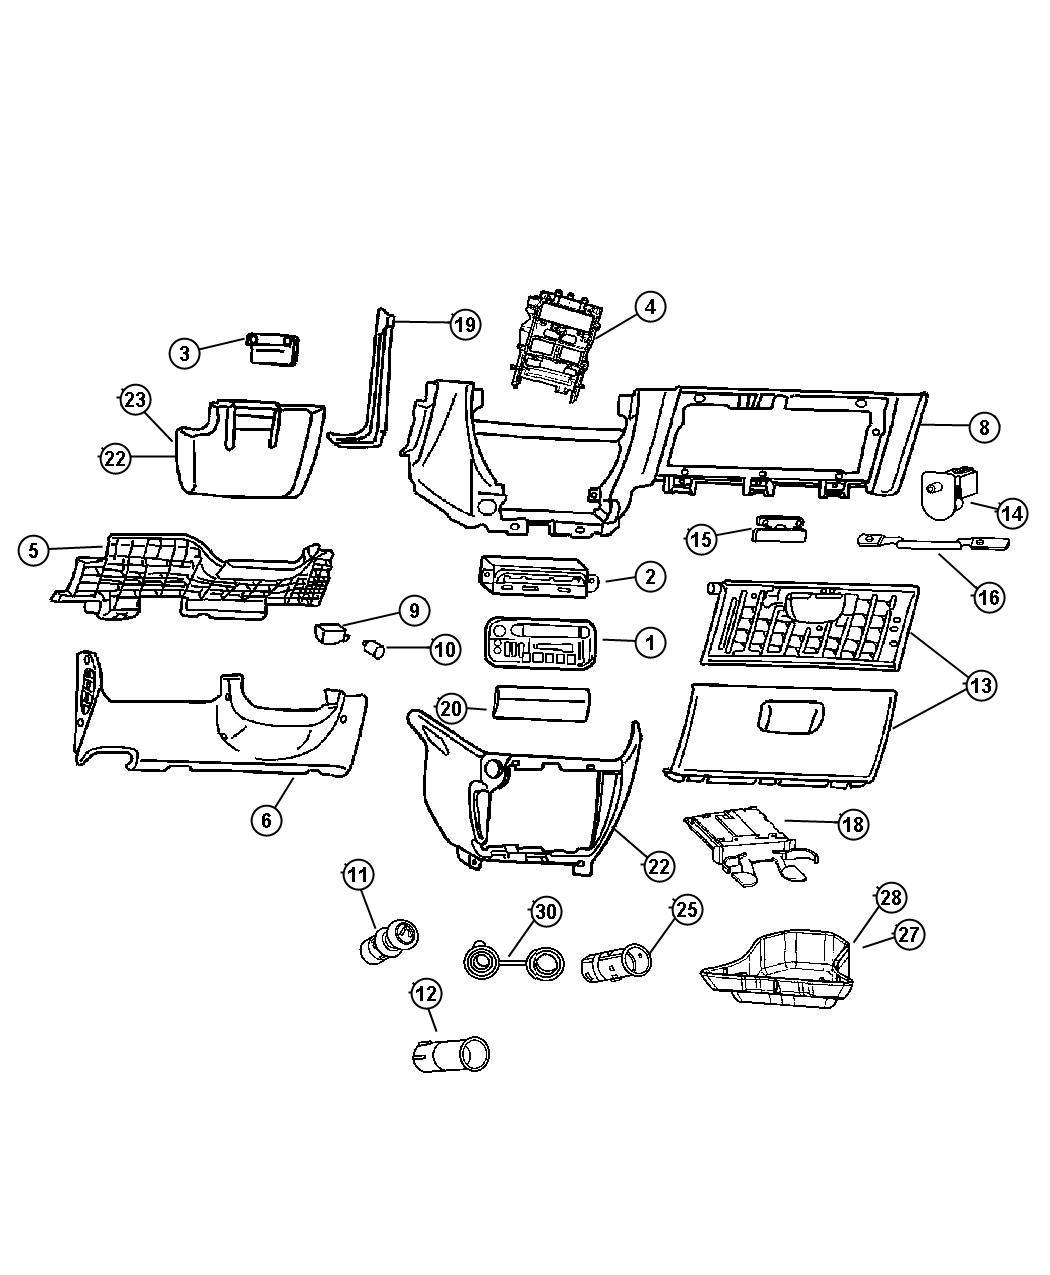 Dodge Grand Caravan Filler Lower Instrument Panel J1